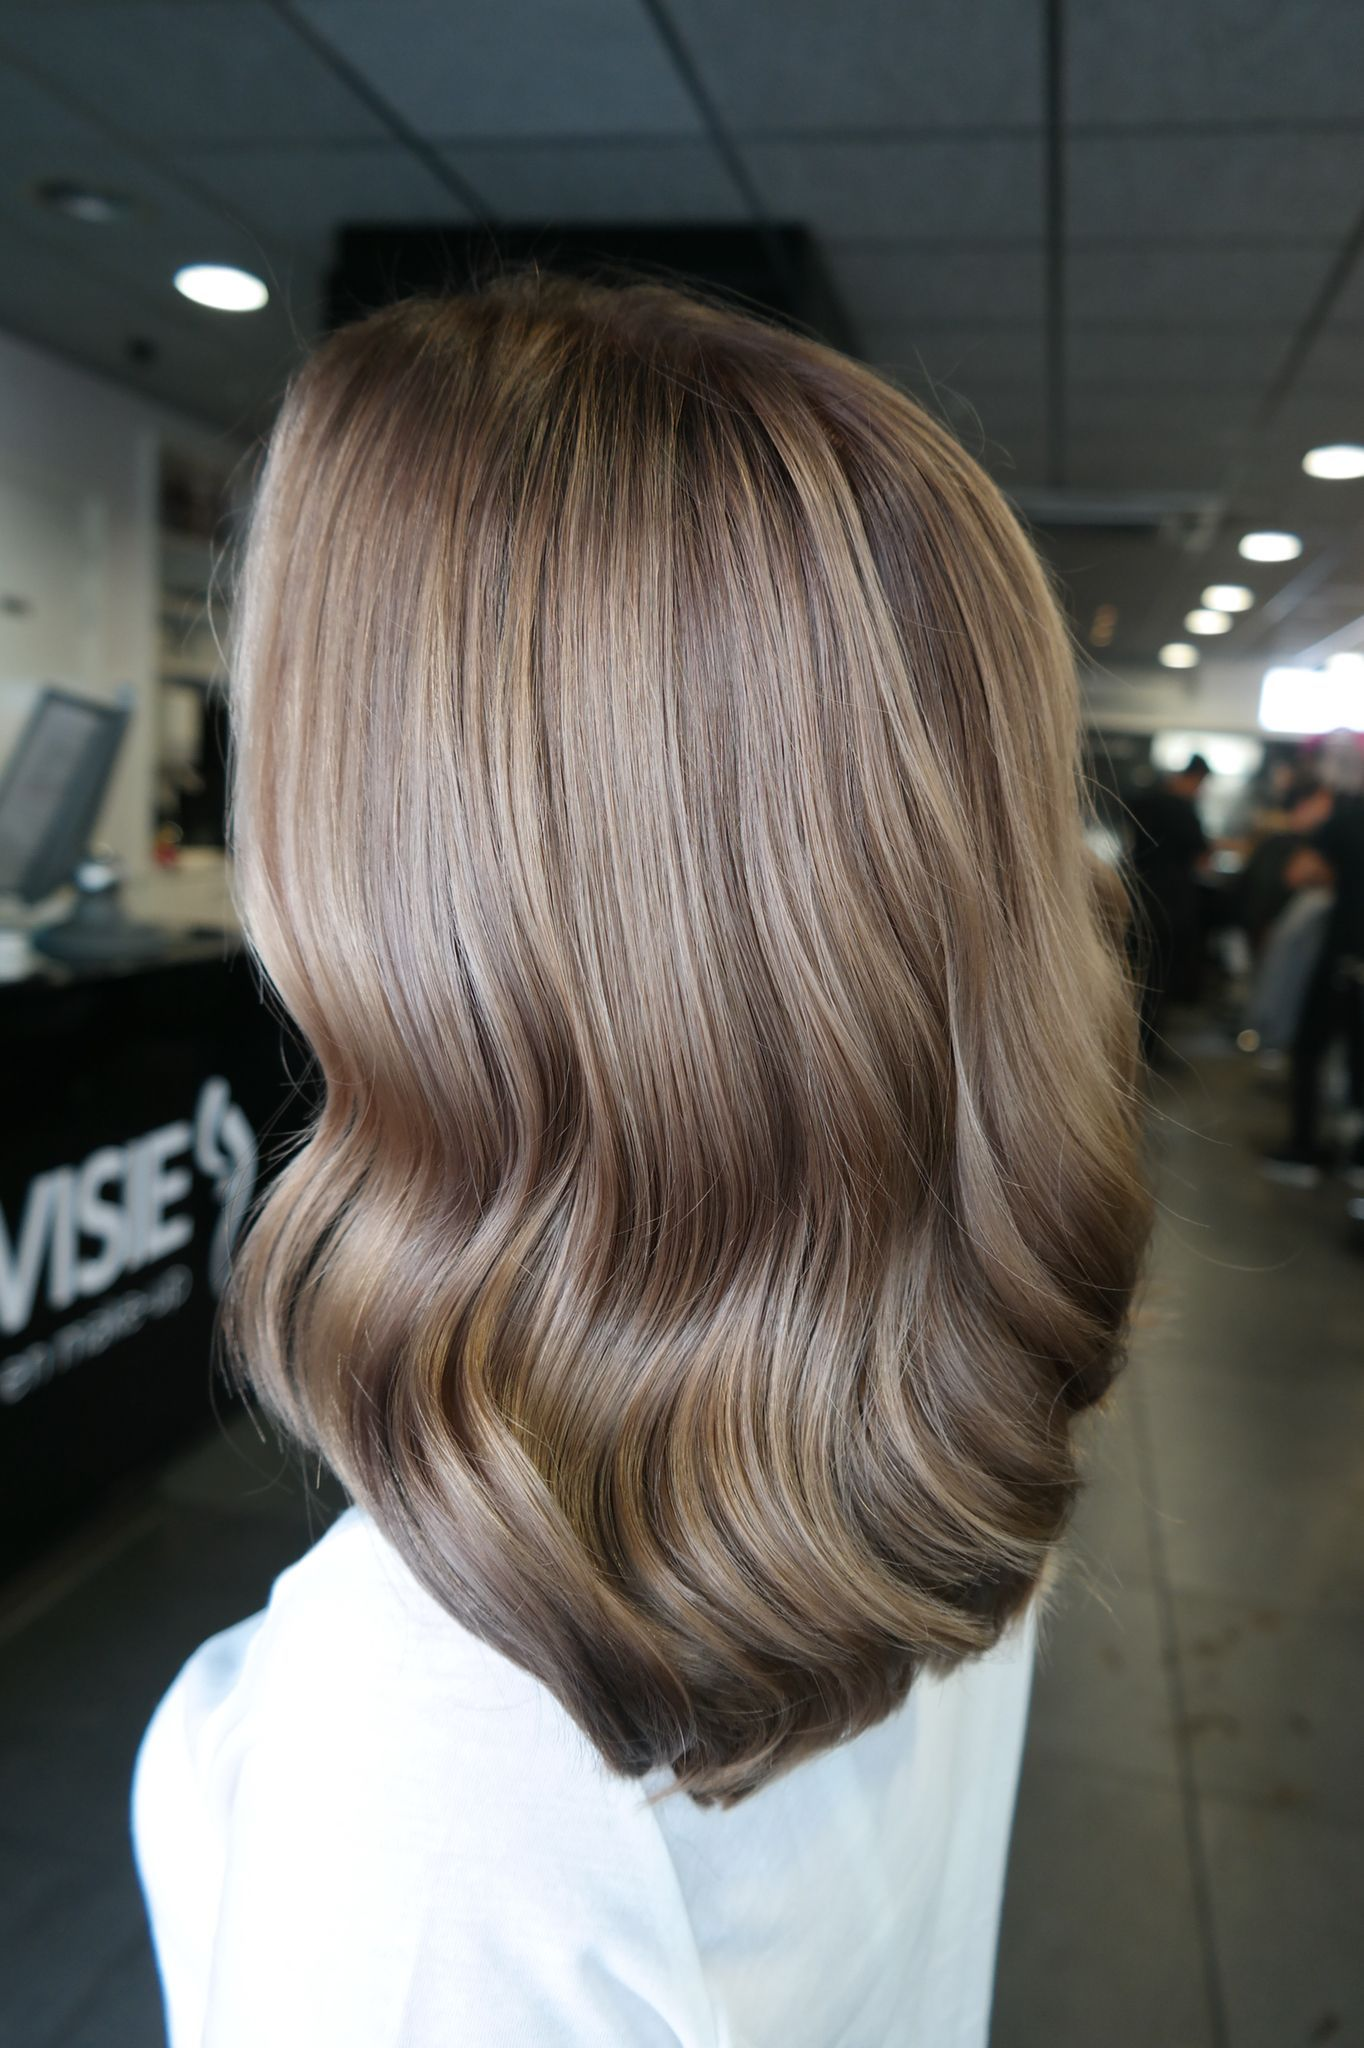 #haarvisie #haarvisierijswijk #haircolor #hairstyle #hairstyle2017 #wella #wellacolor #bronde #highlights #babylights #olaplex #shine #waves #mediumlenght